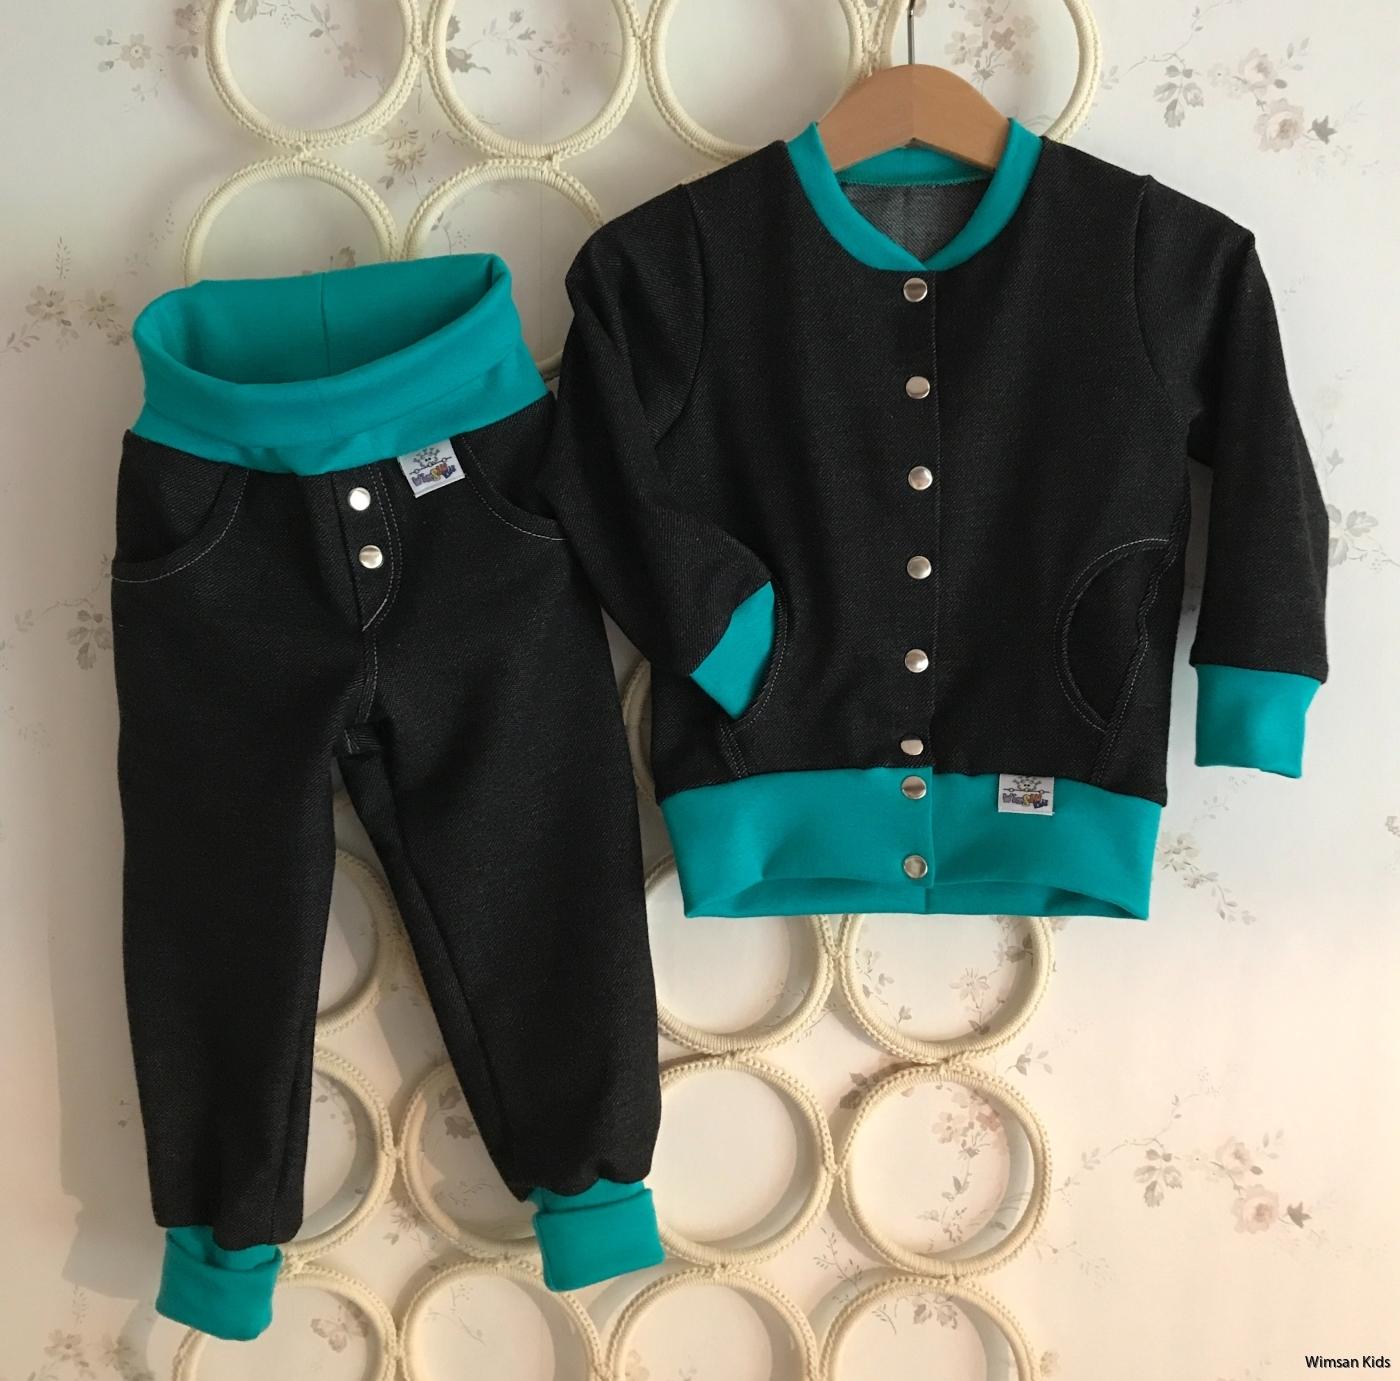 Barnkläder Wimsan Kids tunn jacka